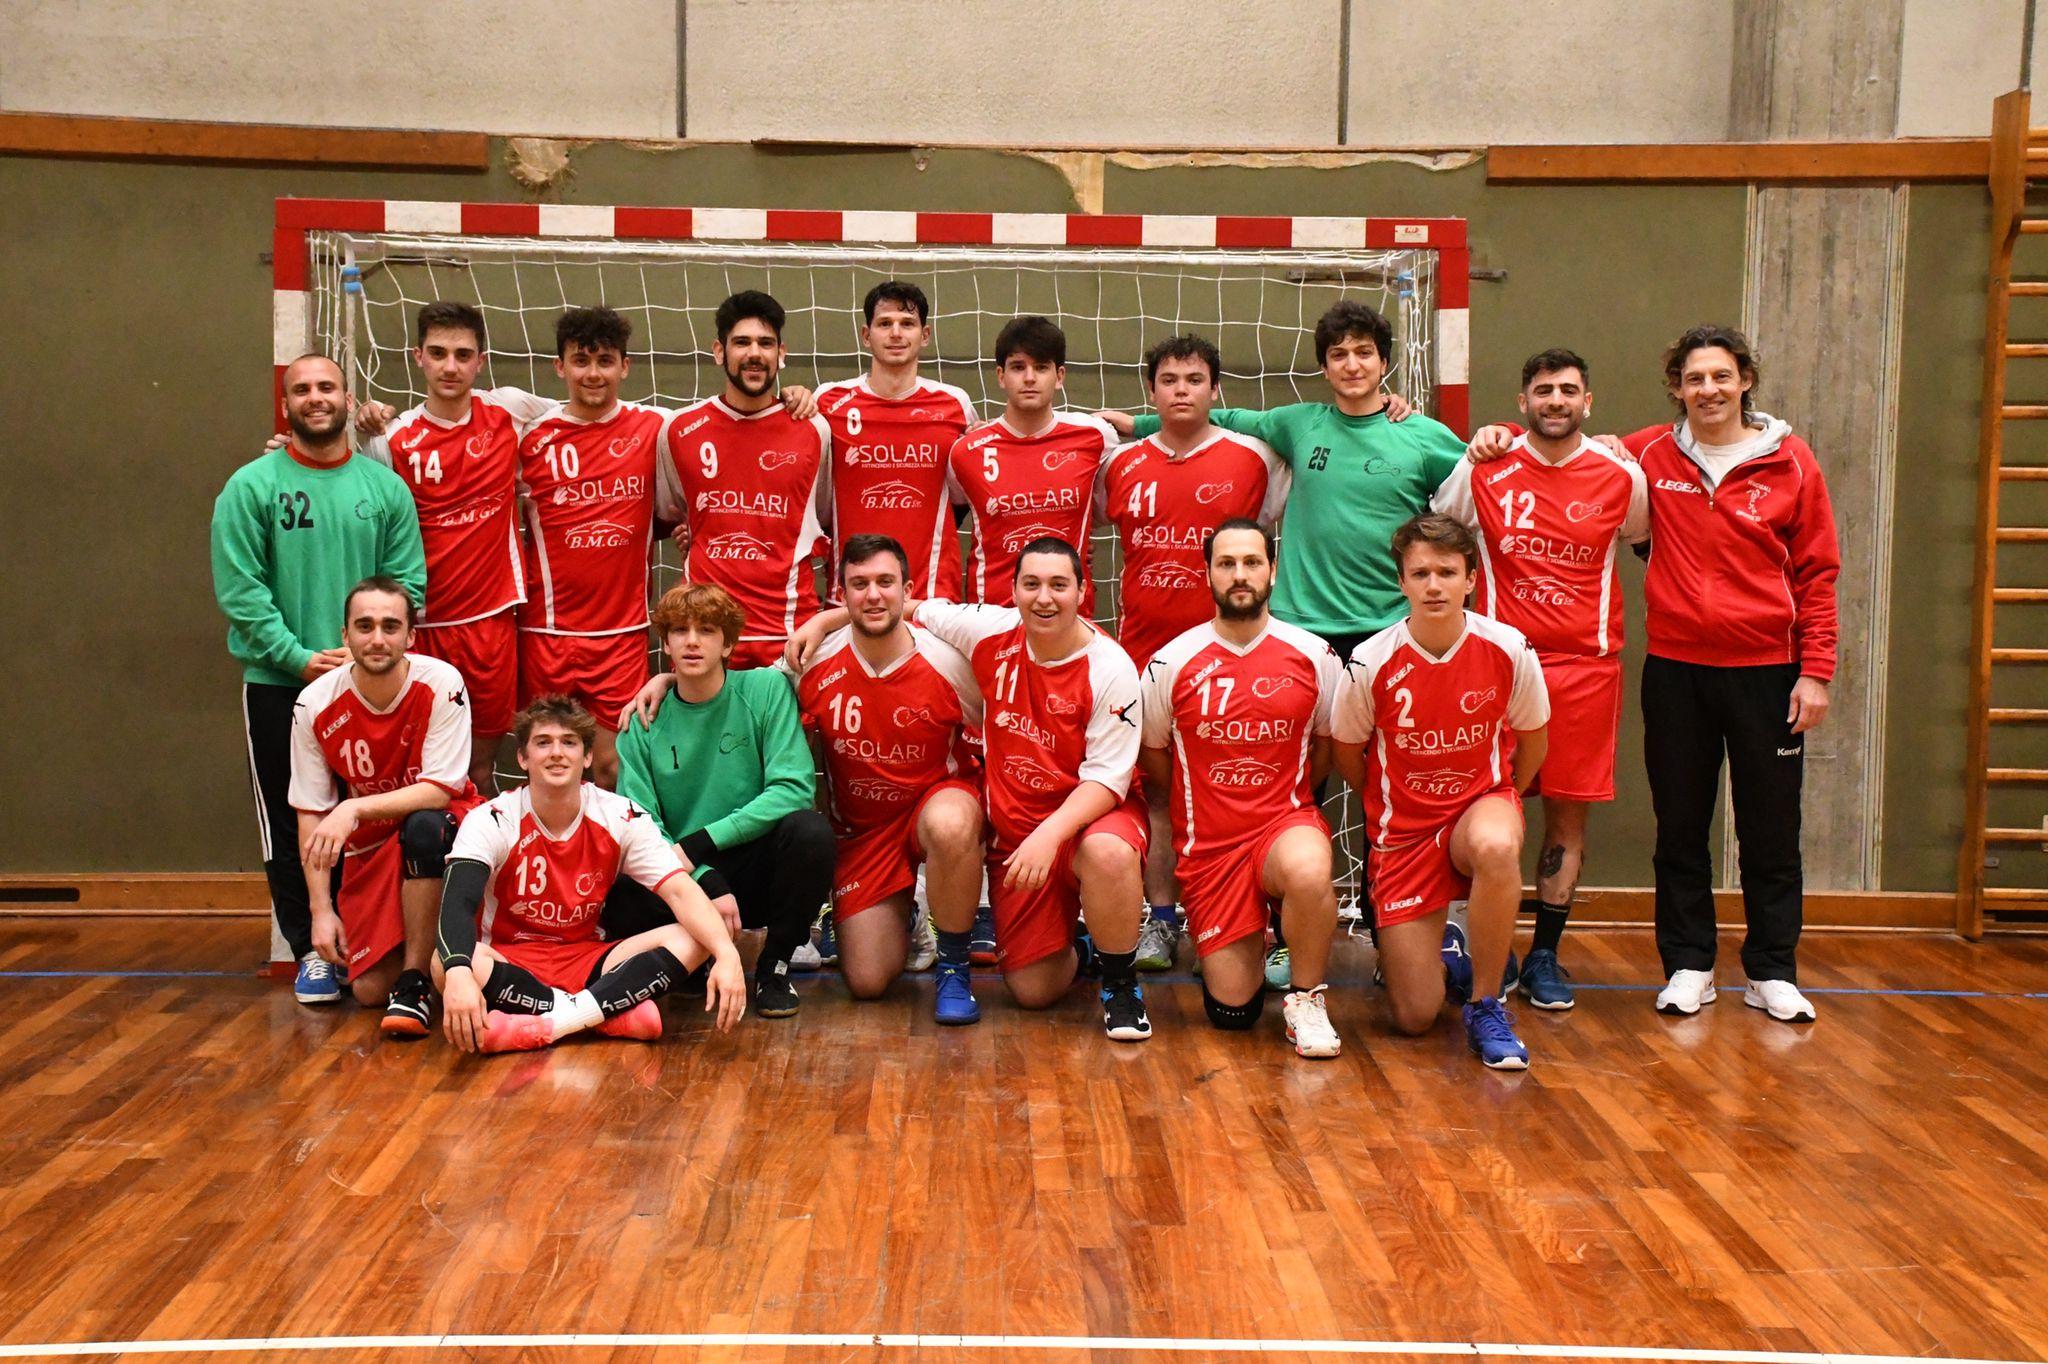 pallamano-grosseto-handball-serie-B-maschile-squadra